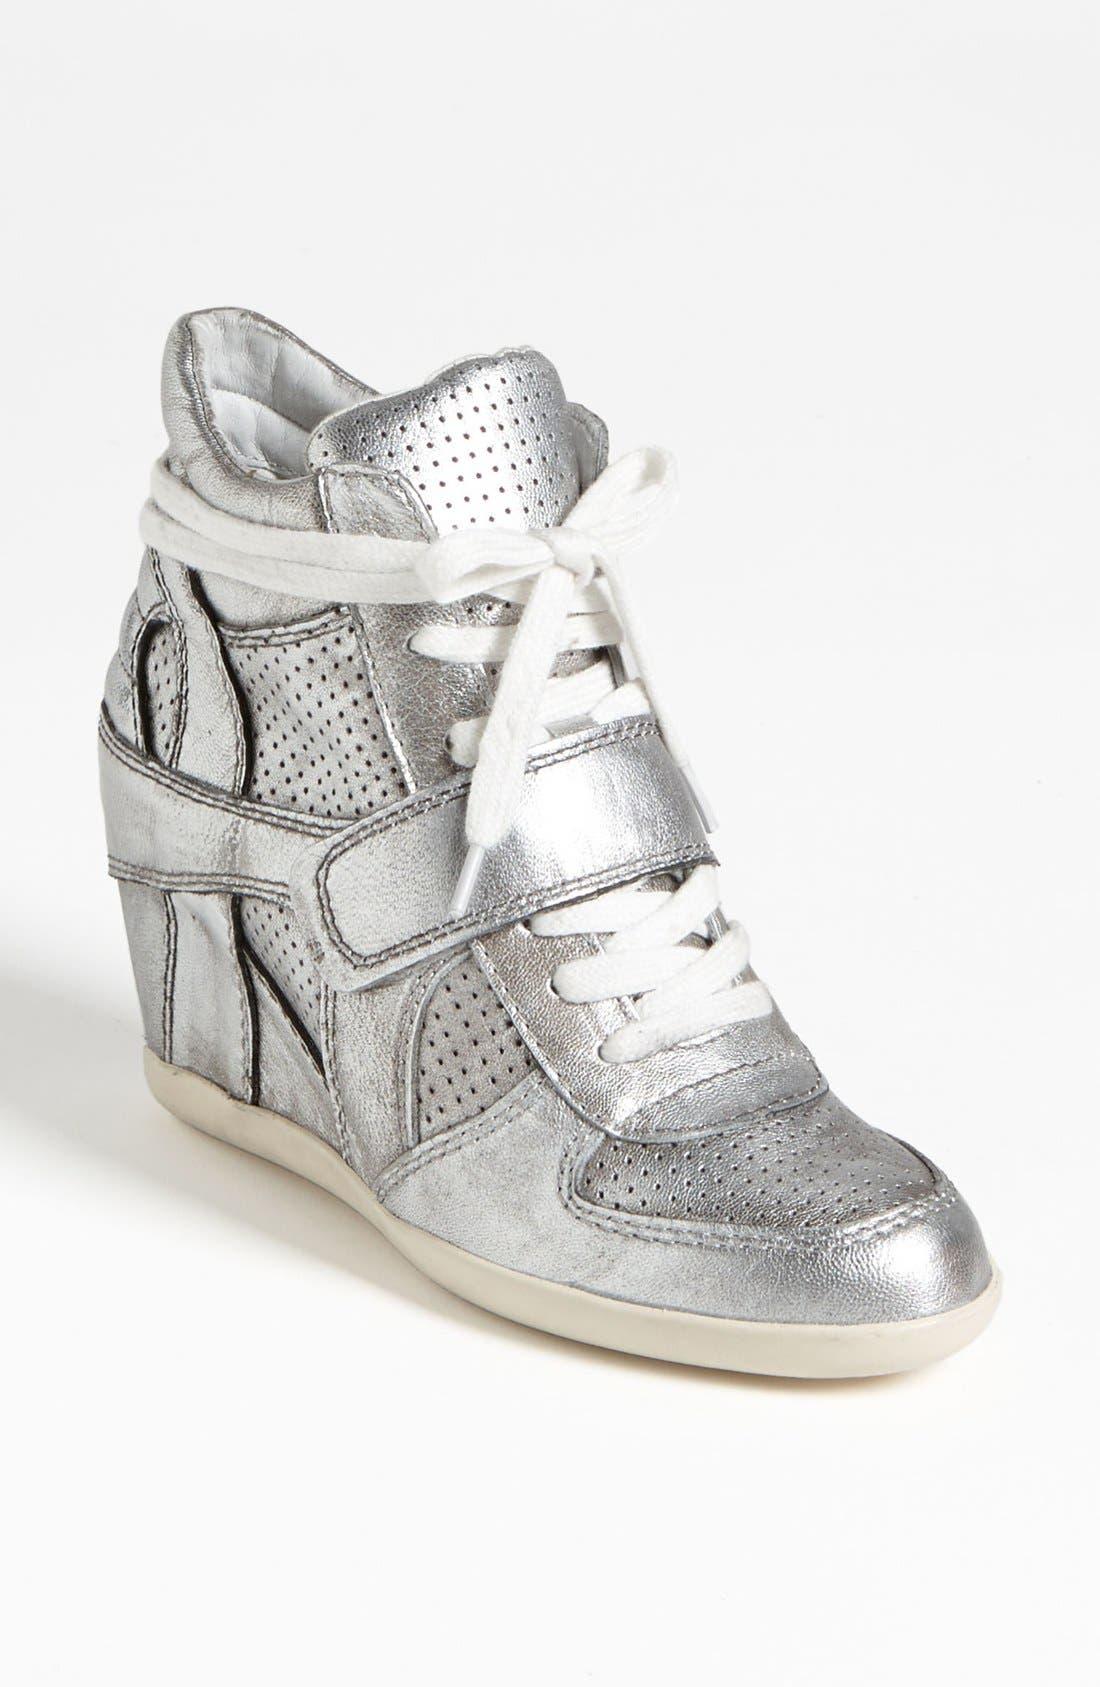 Main Image - Ash 'Bowie Ter' Sneaker